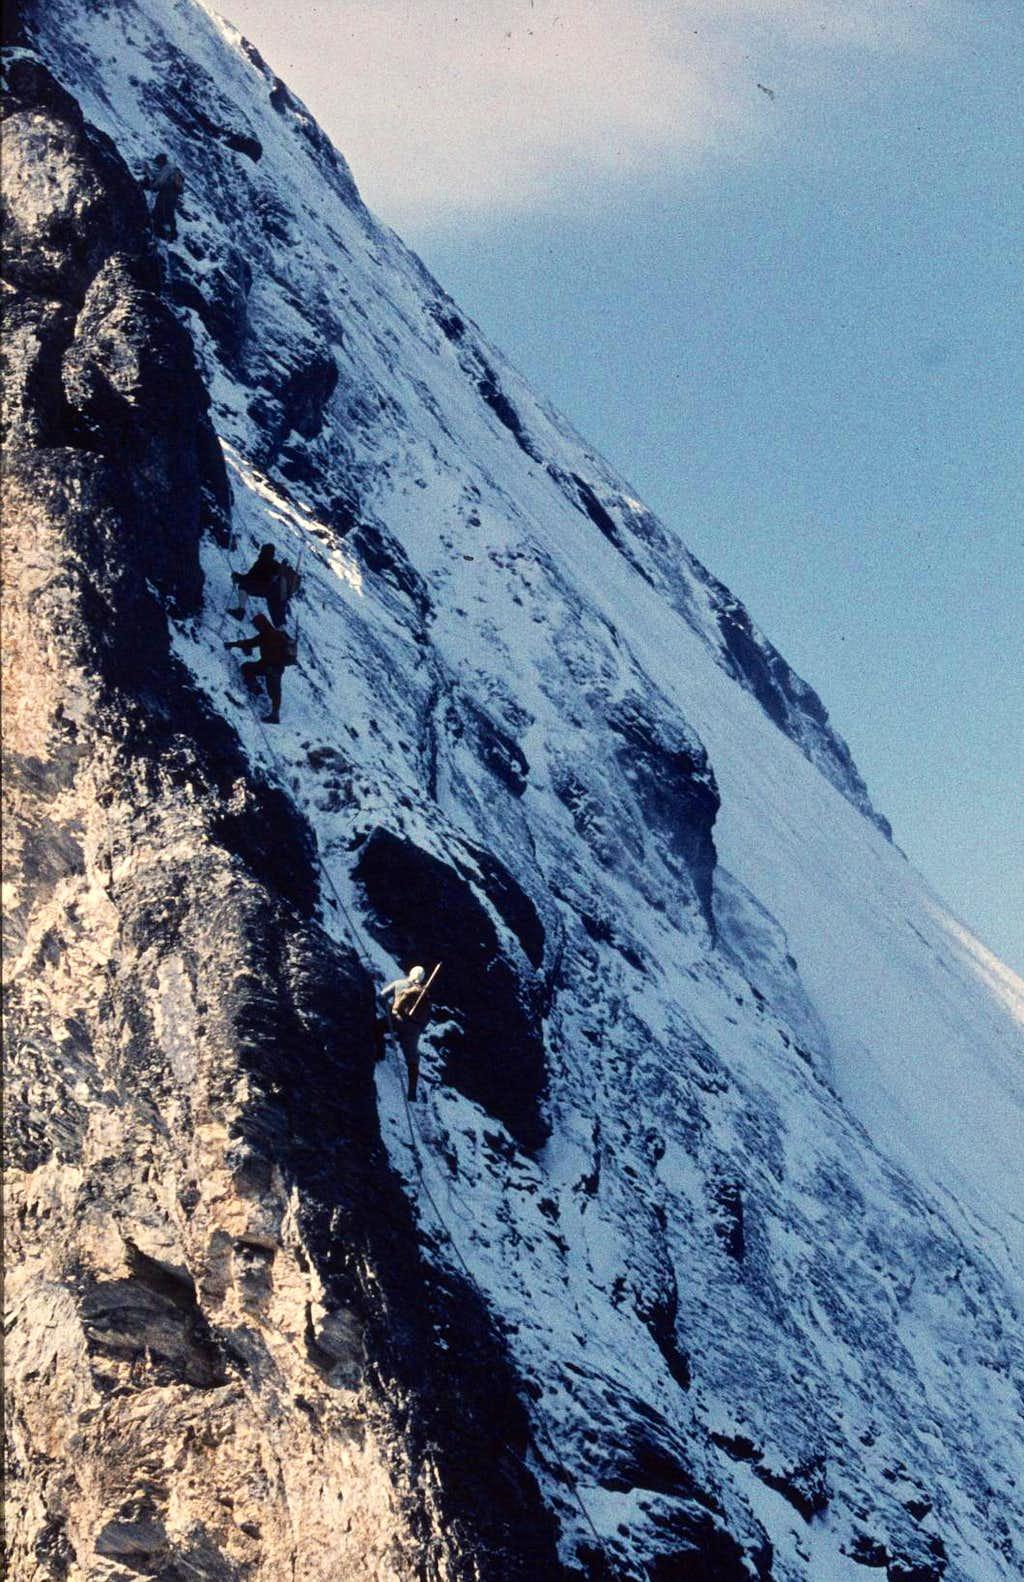 Eiger: Mittellegi ridge. Full...